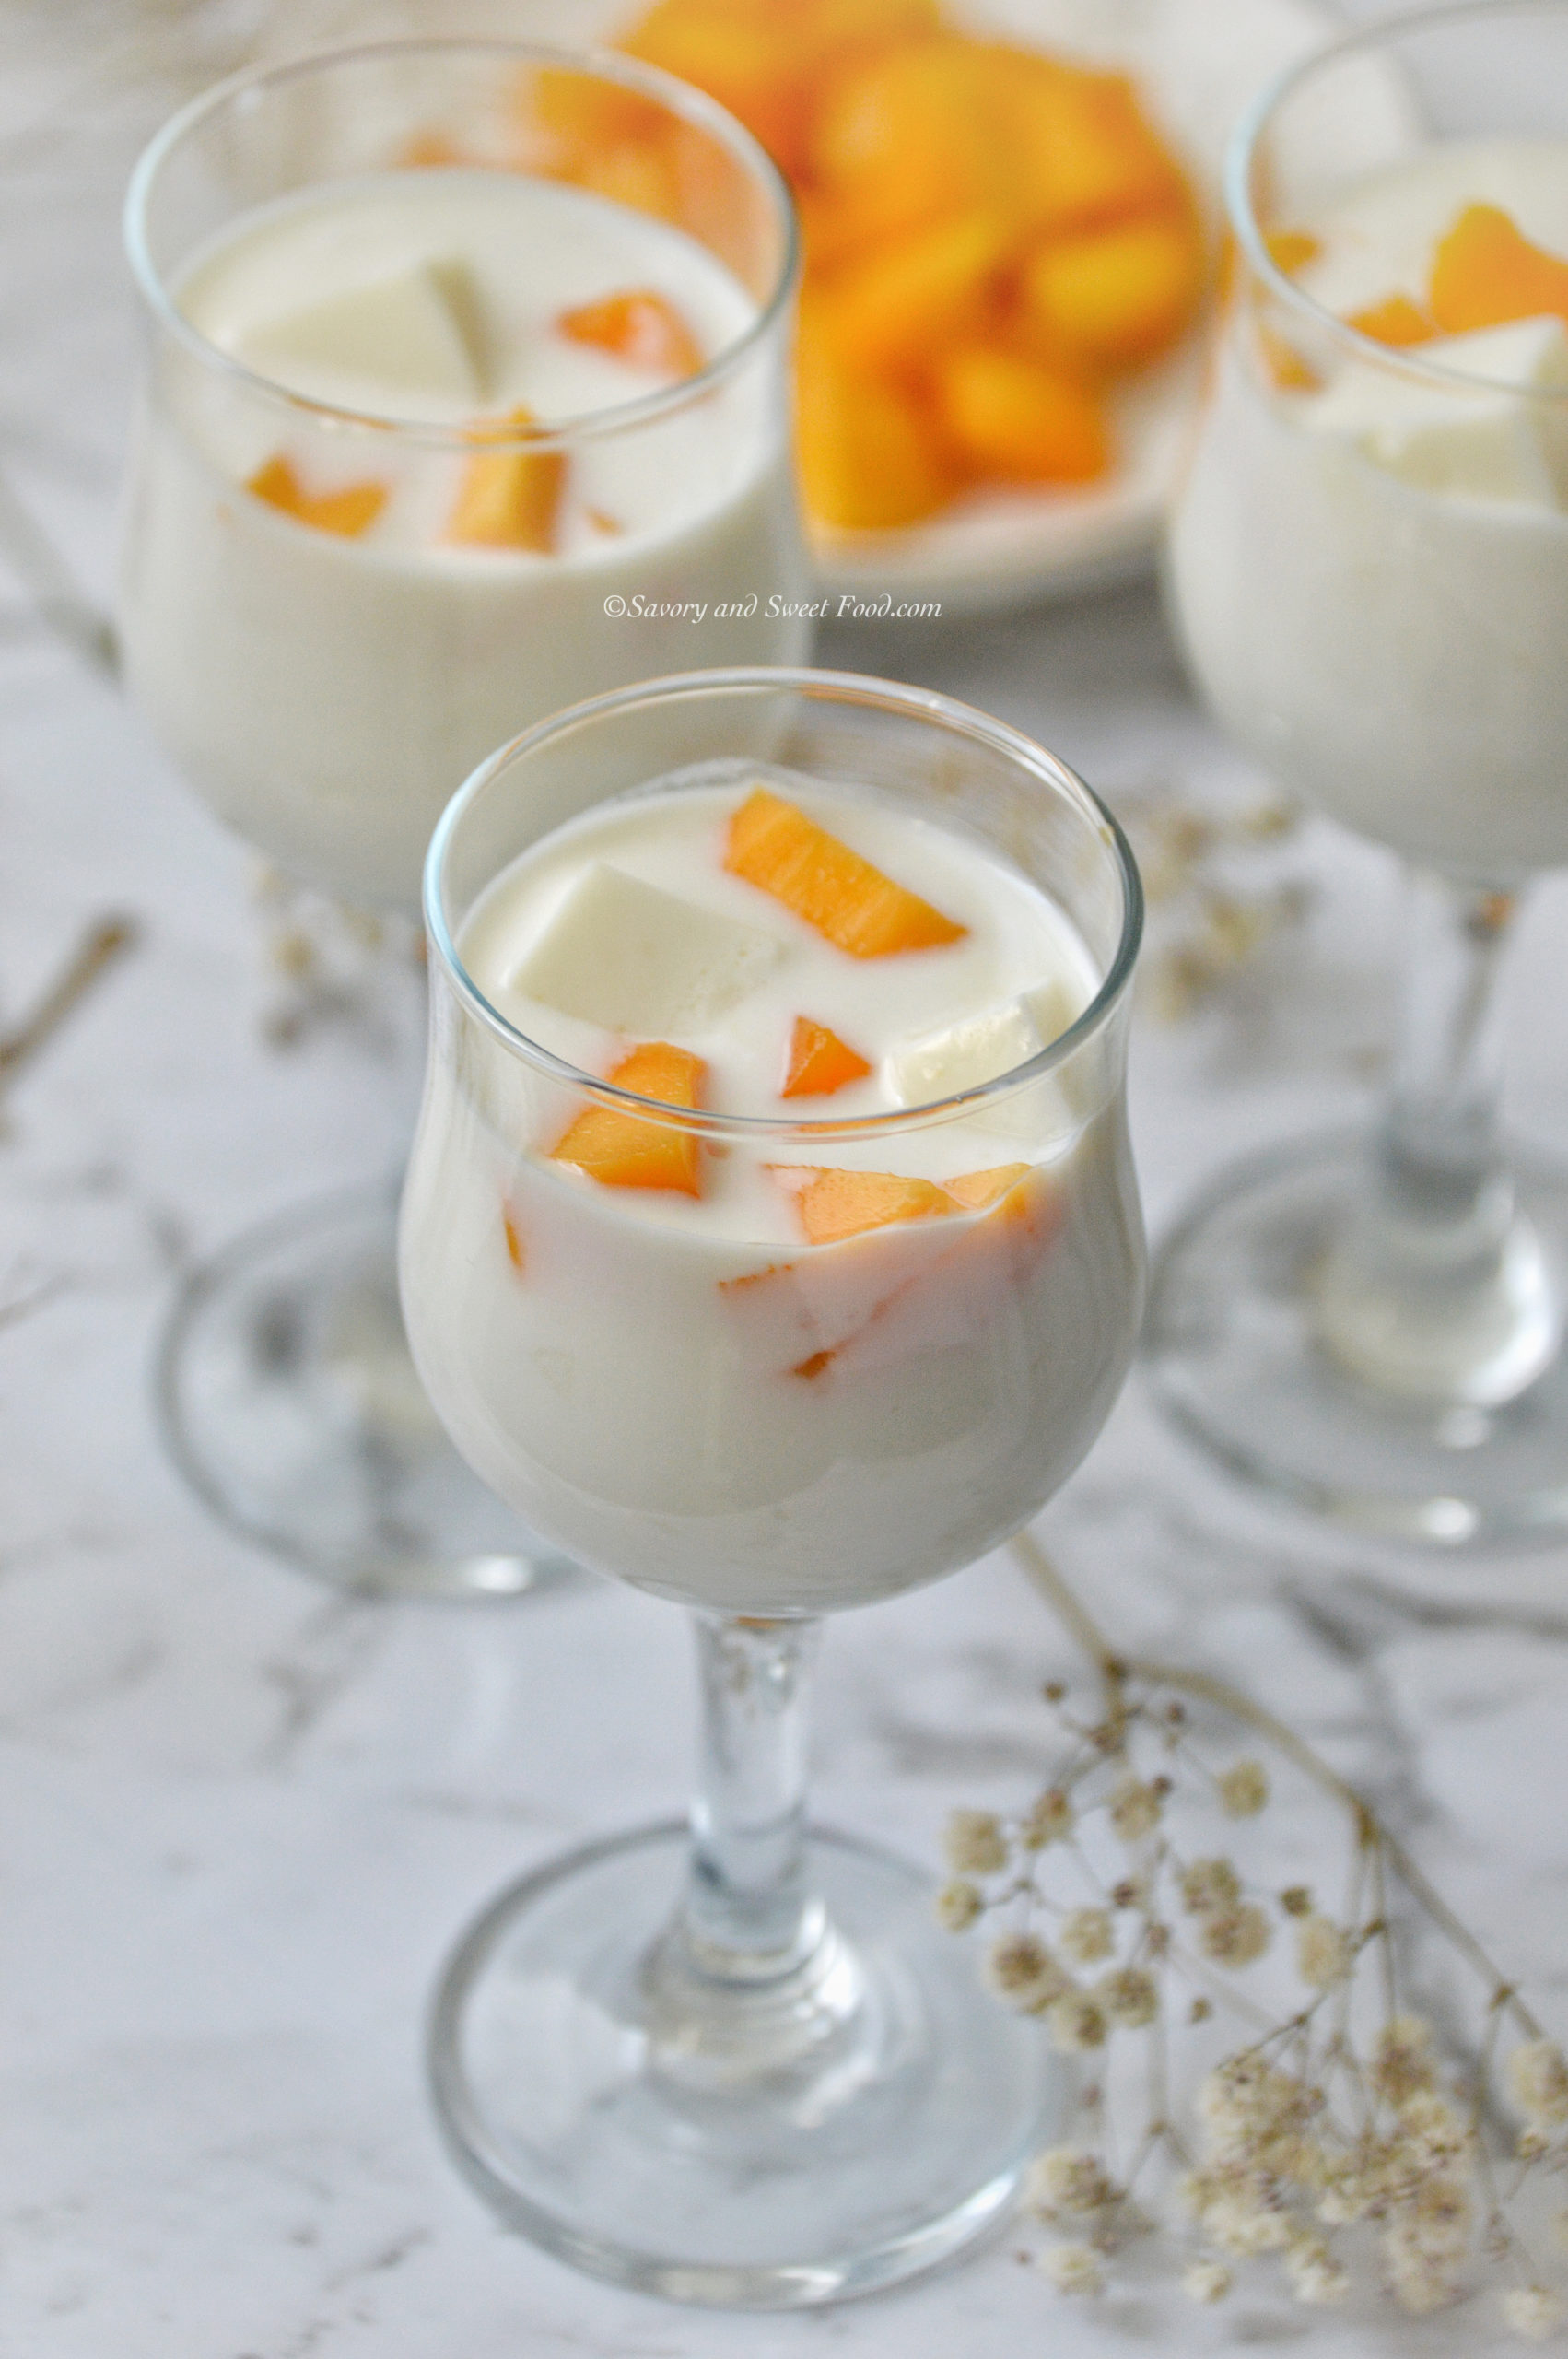 Mango Agar Pudding In Coconut Cream Savory Sweetfood